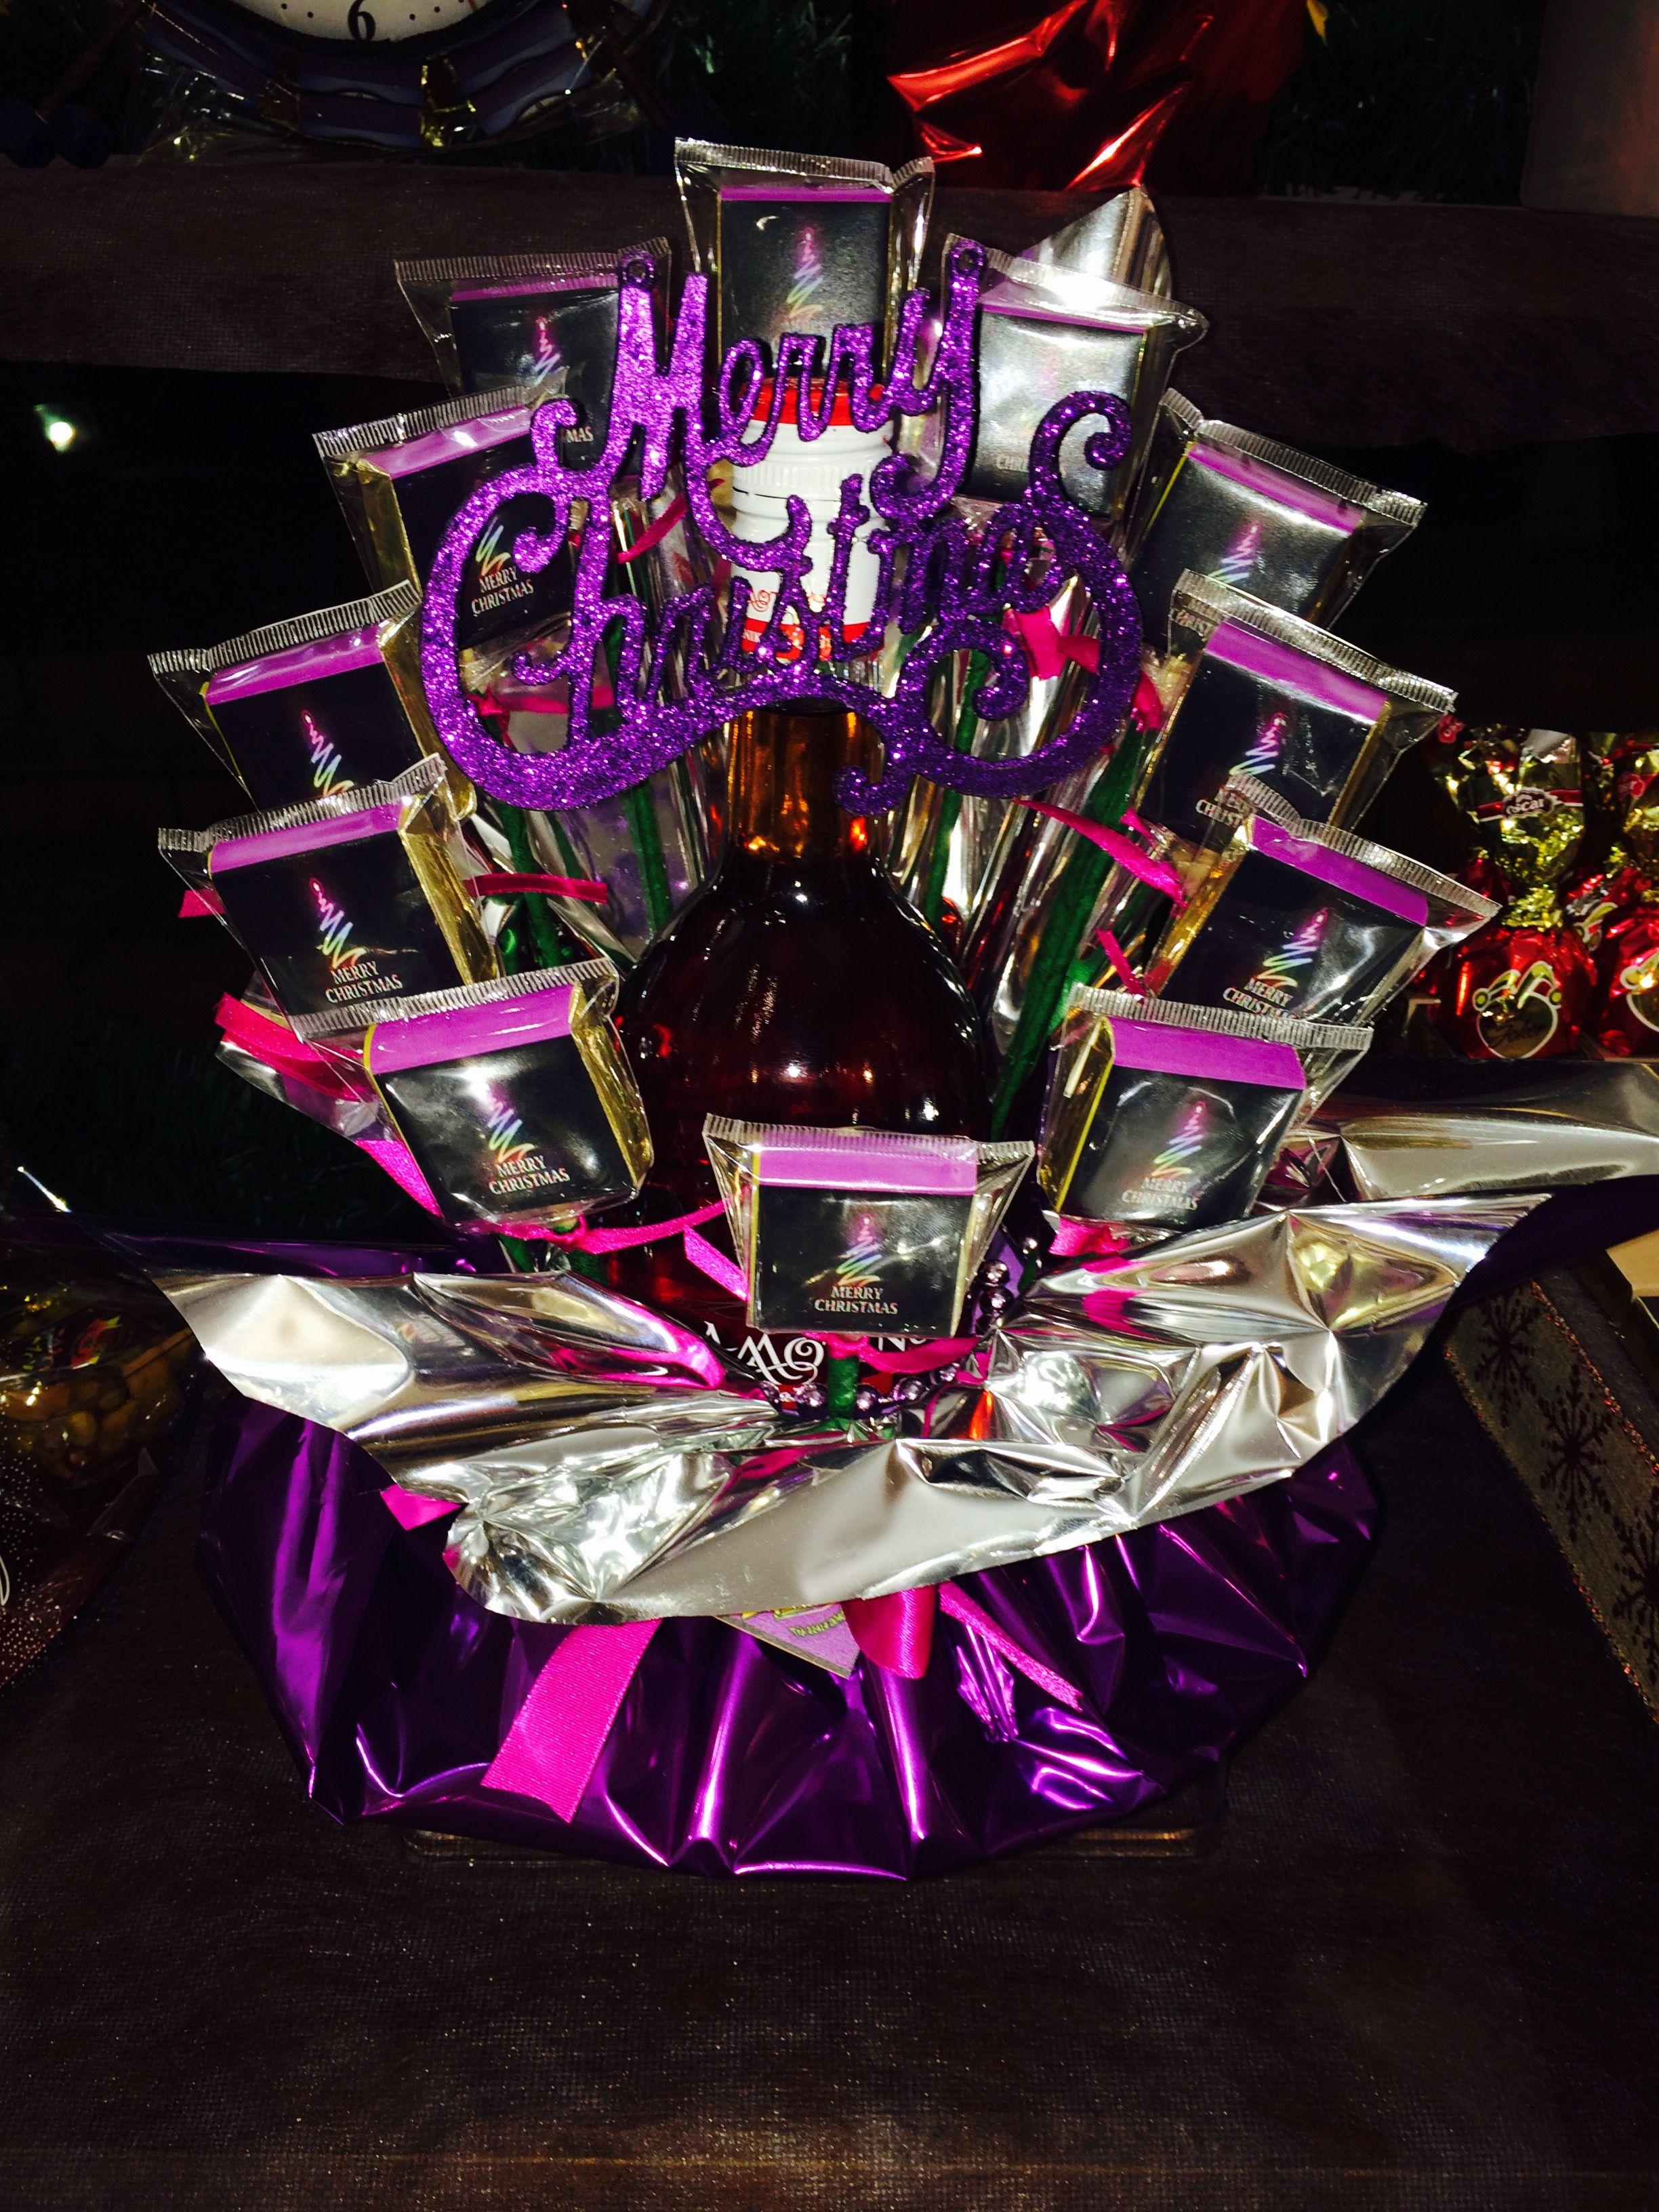 Chocolate & wine bouquet